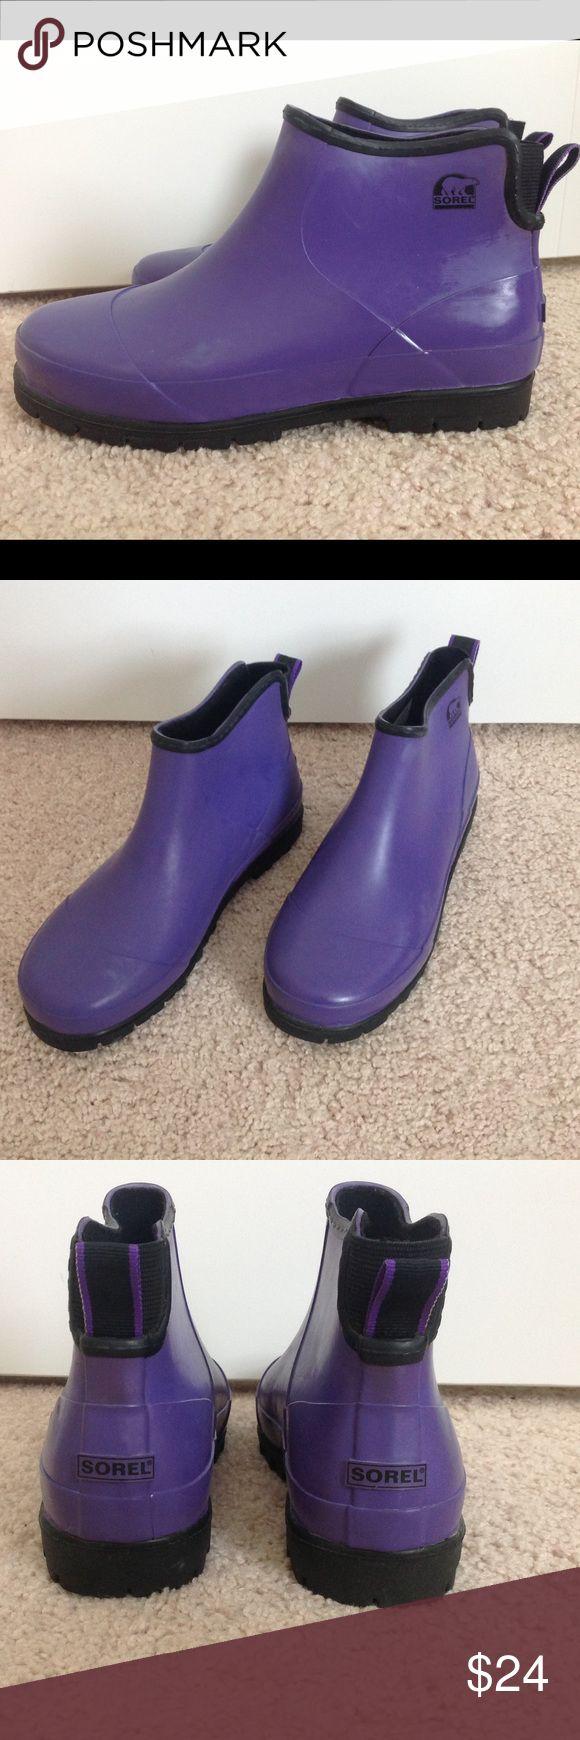 Sorel rain boots. ' Plain flood Chukka ' Pretty waterproof boots. Perfect to slip on in wet grass. Womens size 5. Sorel Shoes Winter & Rain Boots